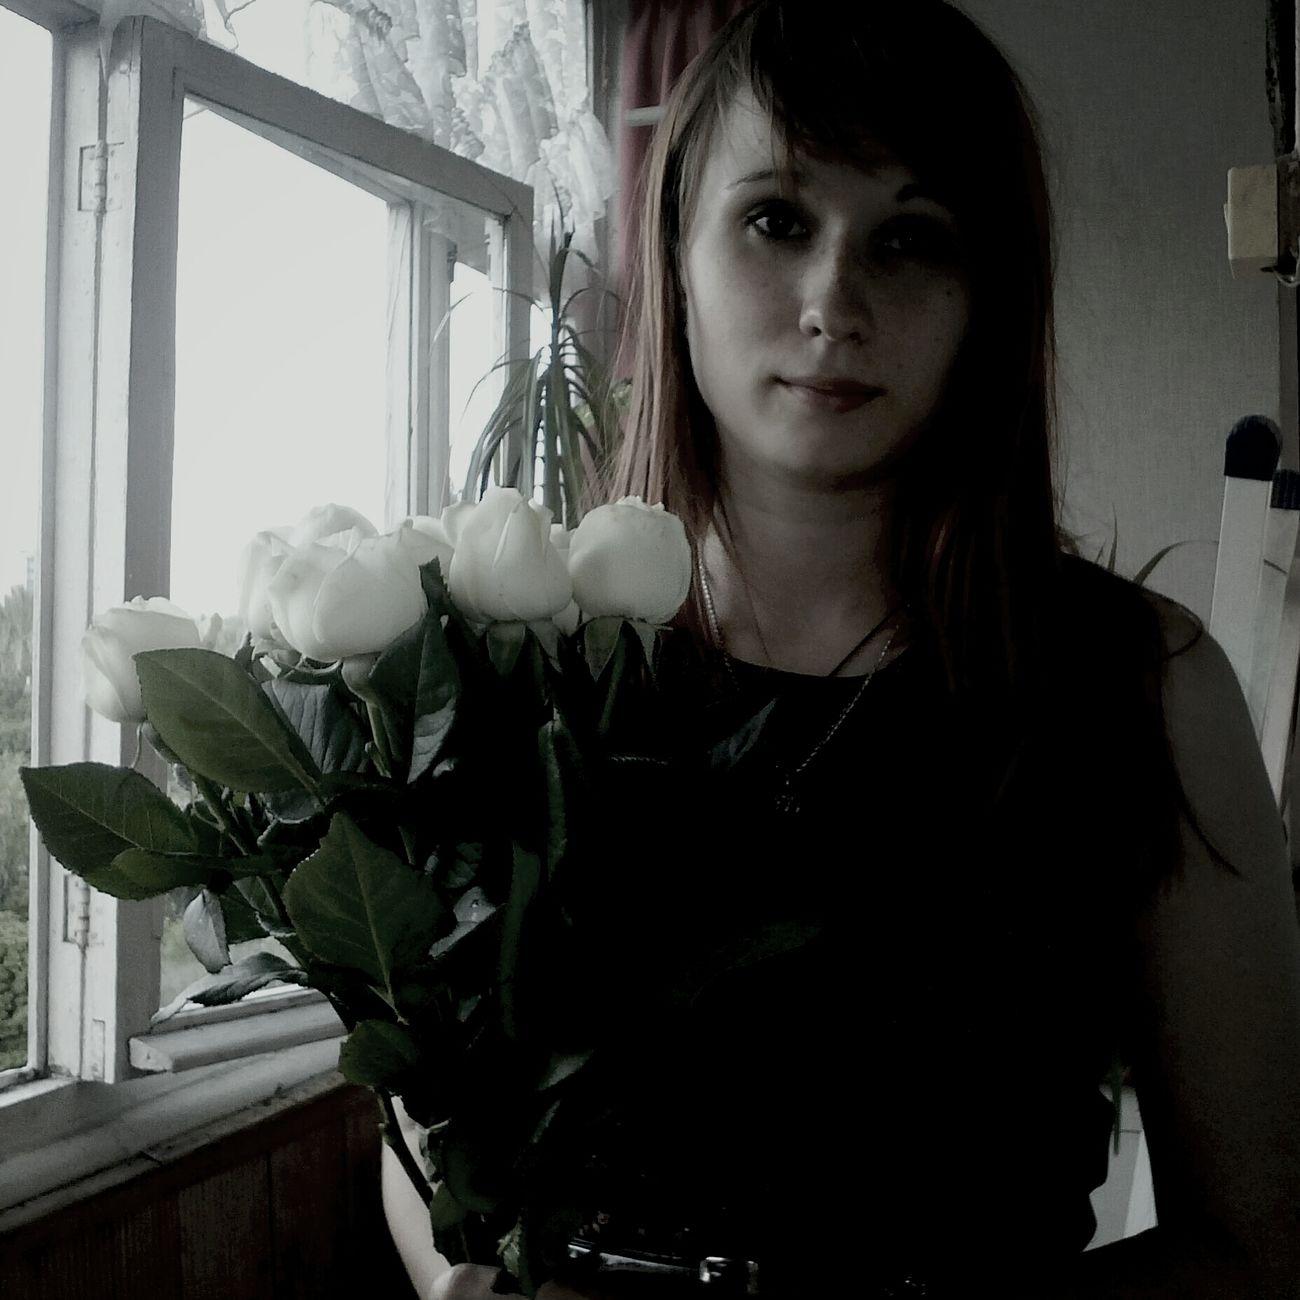 Flower Love ♥ Nice Present